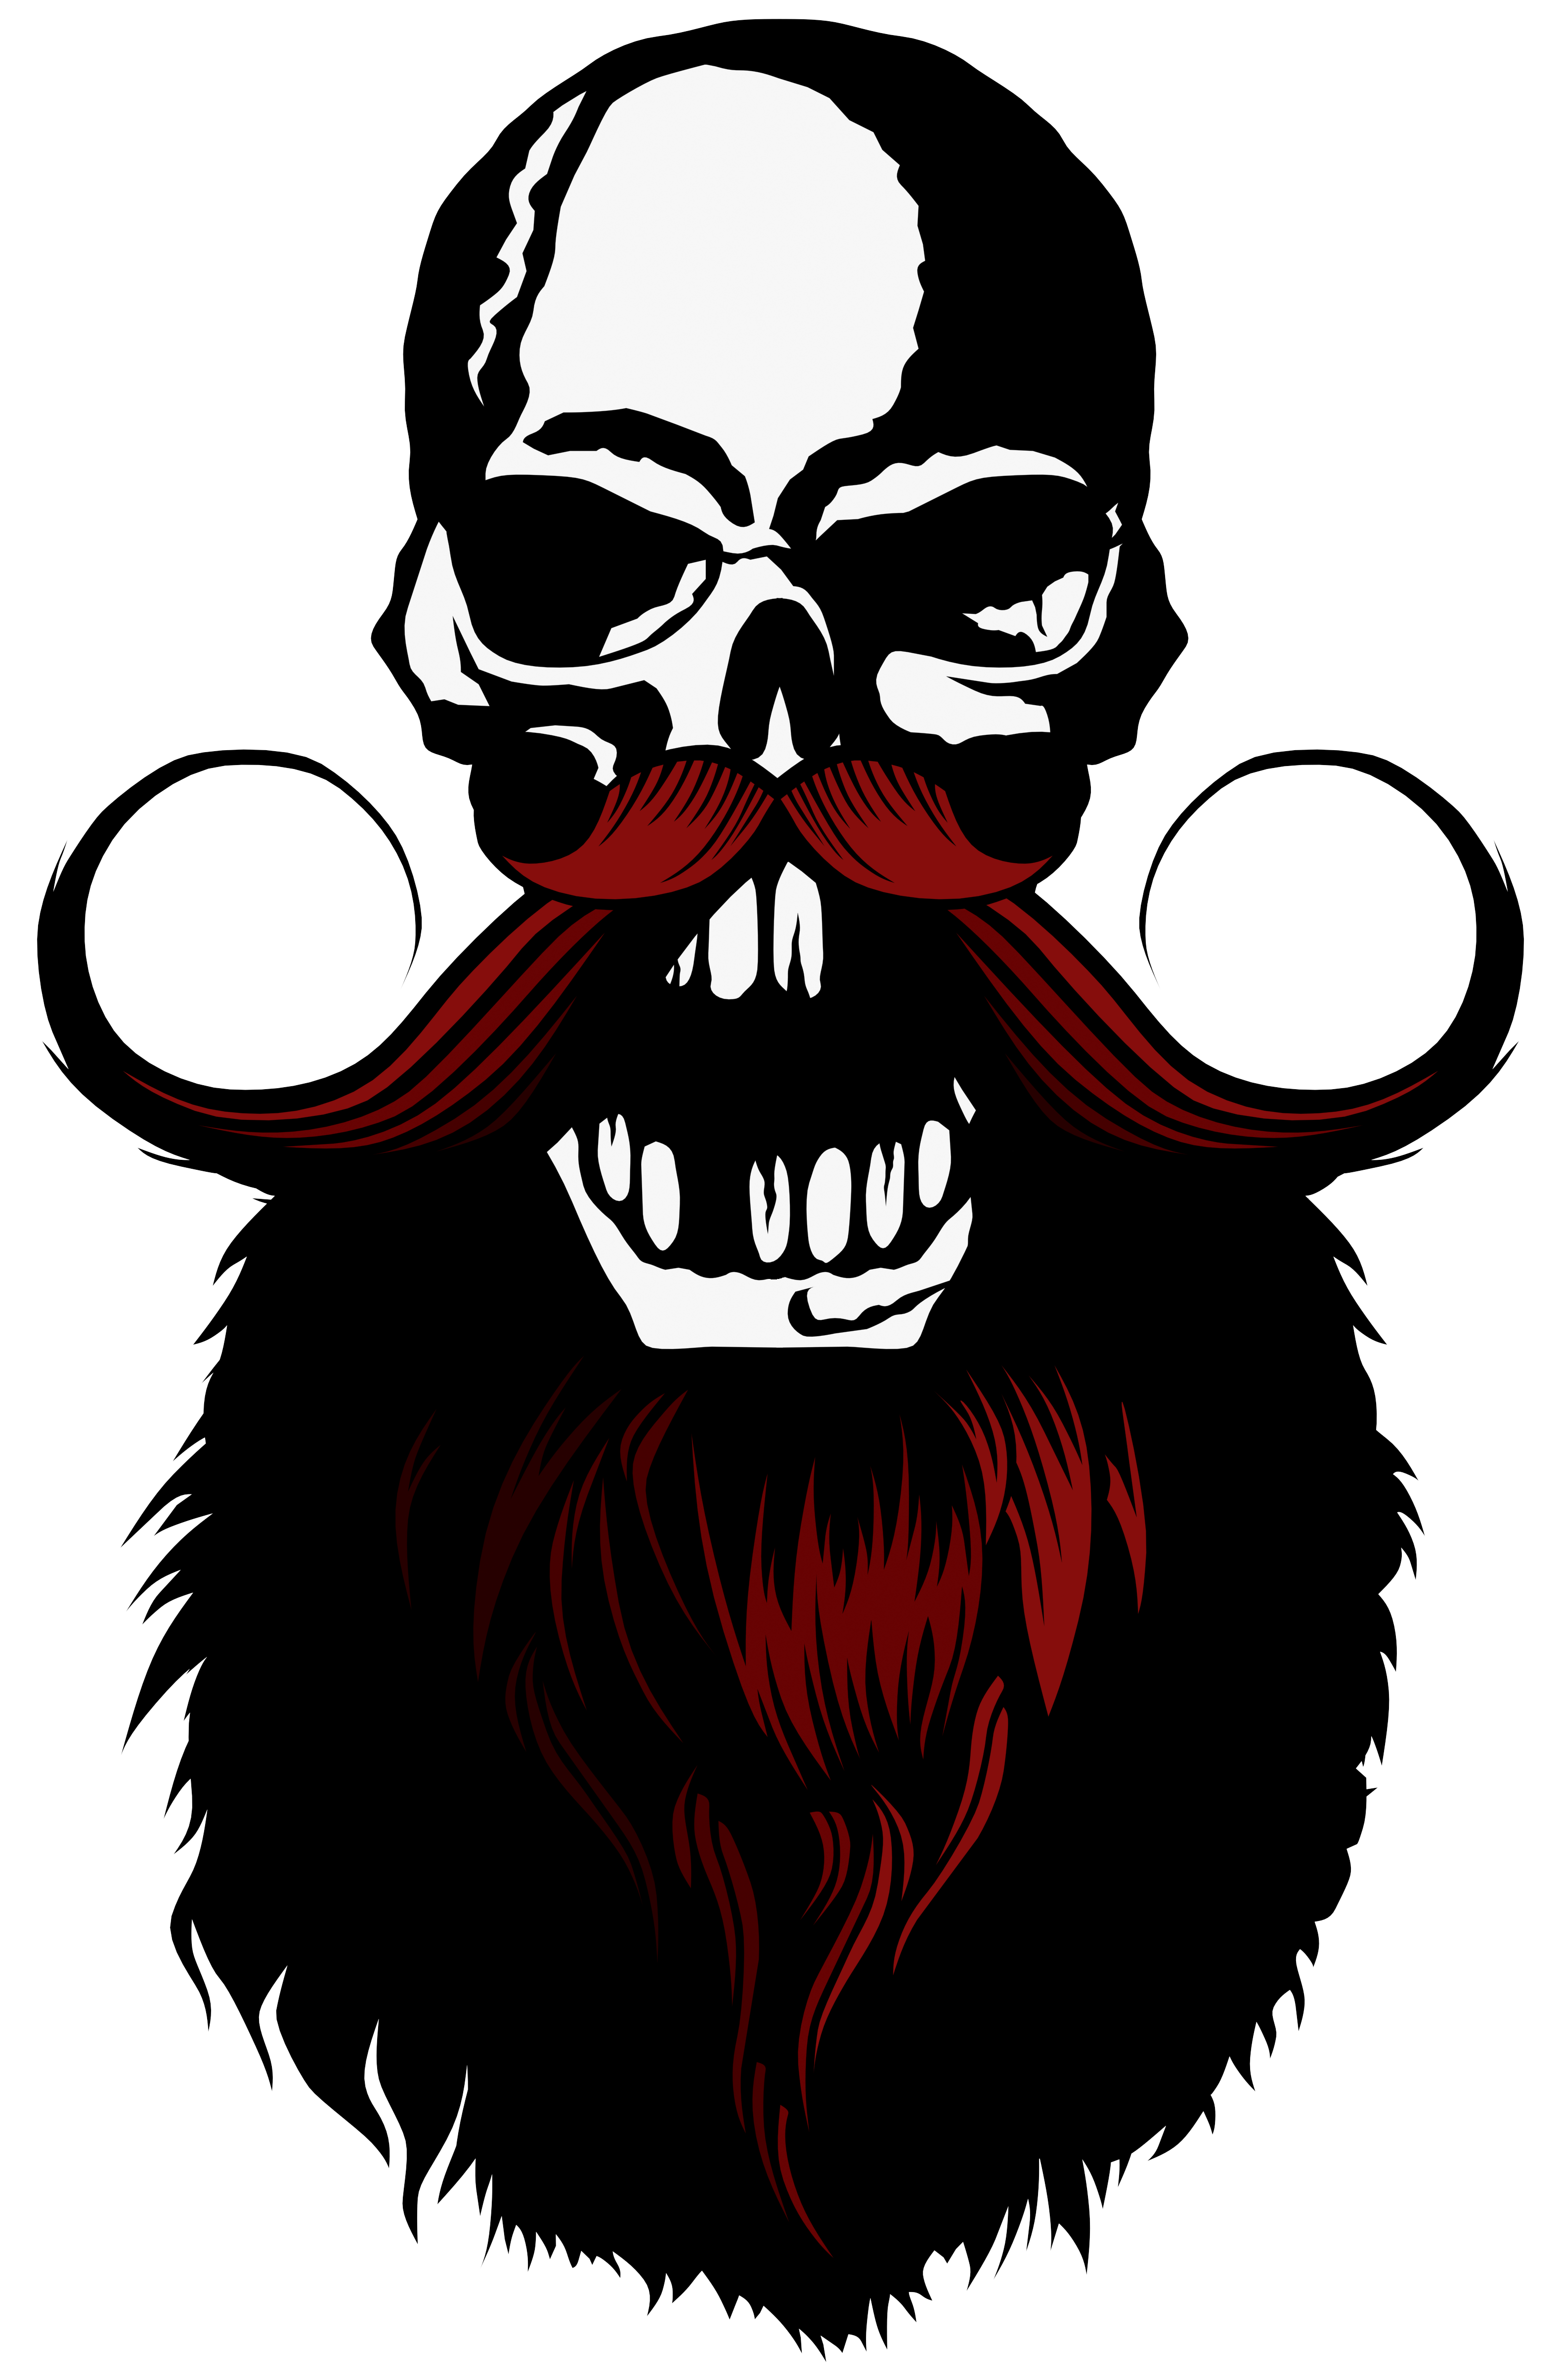 clip art royalty free download Tee shirt de mort. Brother clipart tete